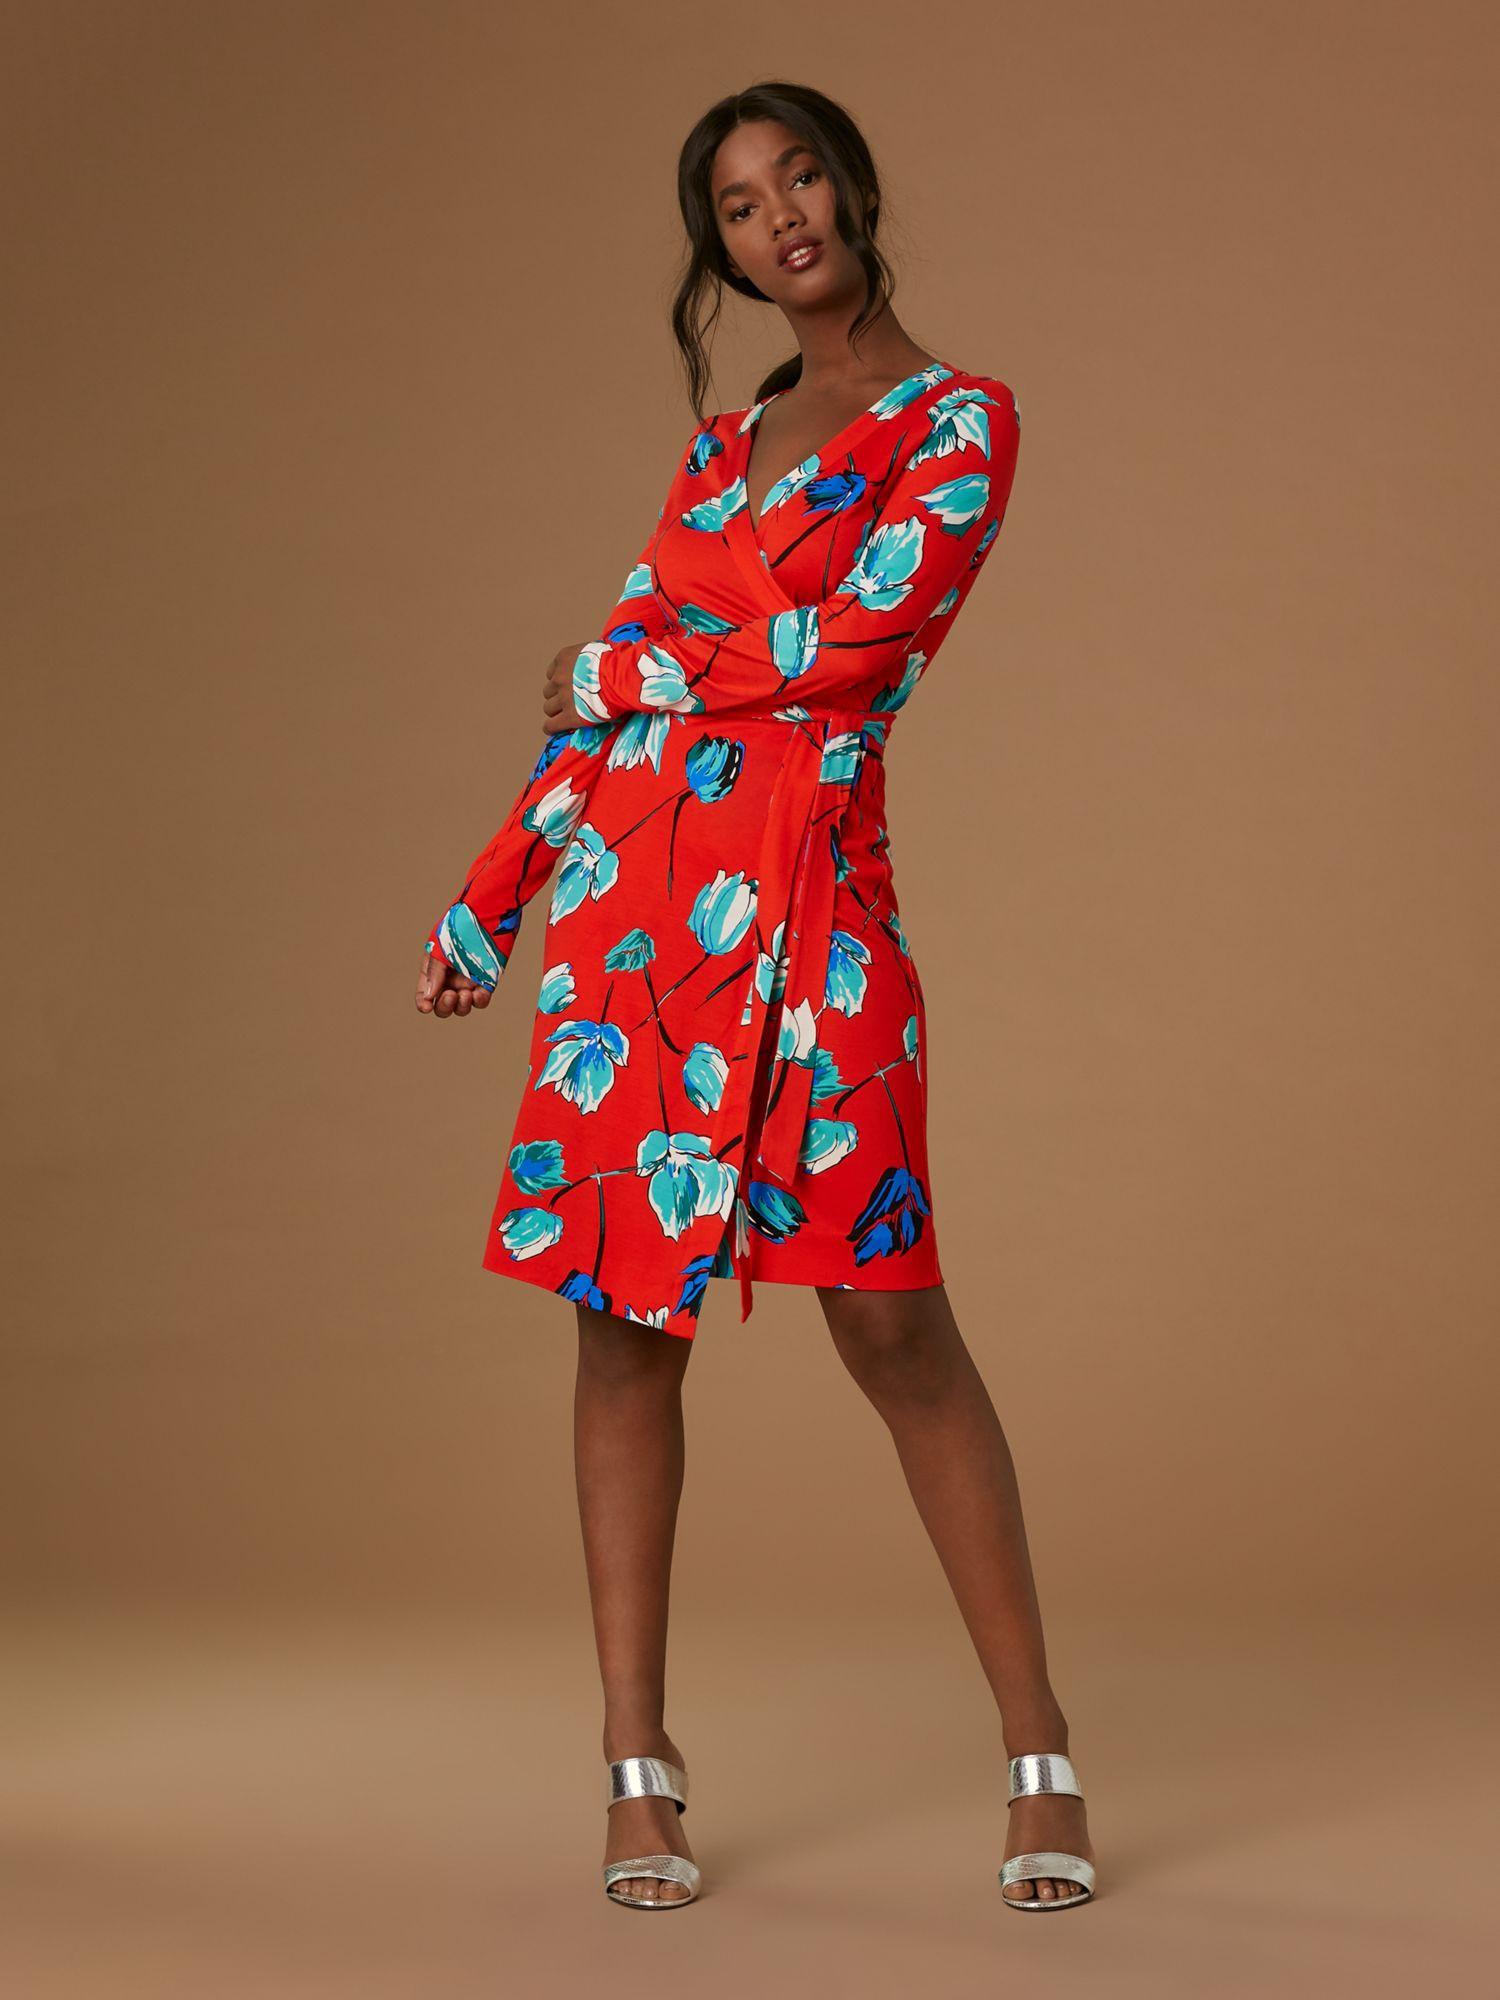 7303467ea5e3 Diane Von Furstenberg Dvf Julian Banded Silk Jersey Wrap Dress - Asher  Vermillion 10